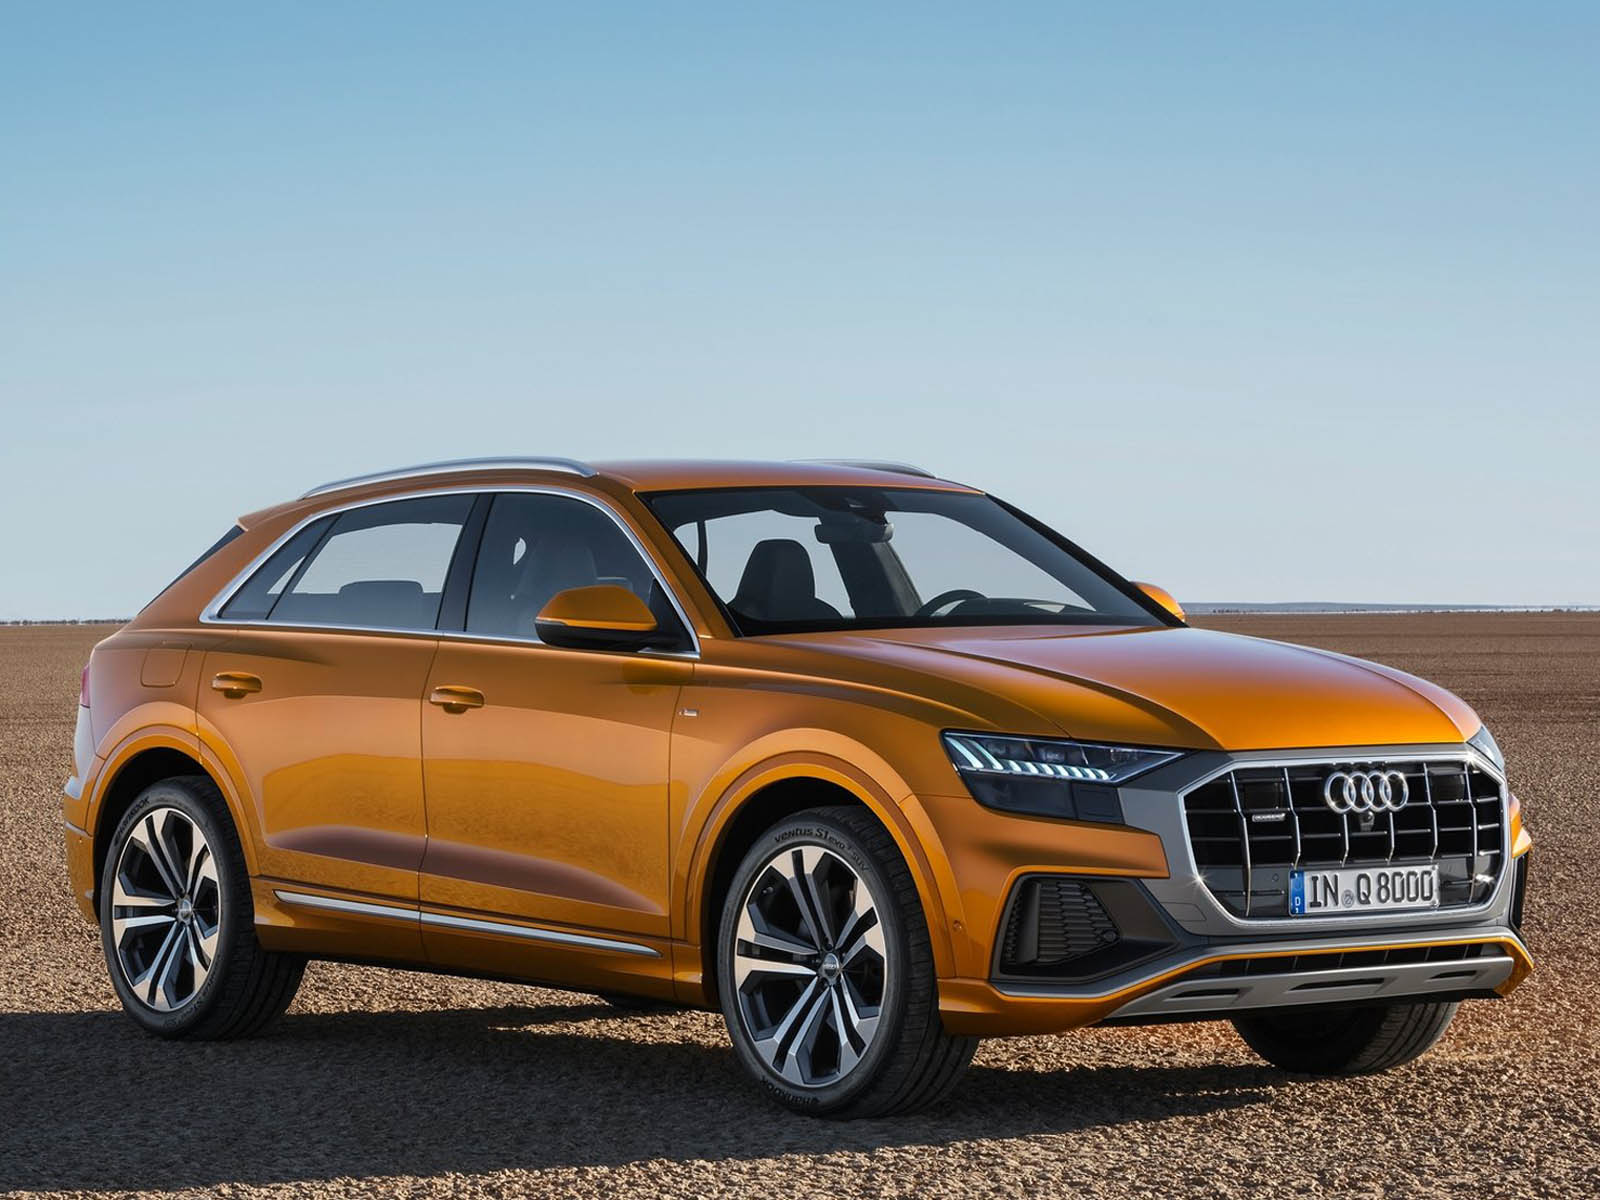 2018 Audi Q5 Hybrid: News, Powertrain, Arrival >> Audi Rs Q8 Could Get The Panamera S 670 Hp Hybrid Powertrain Car News